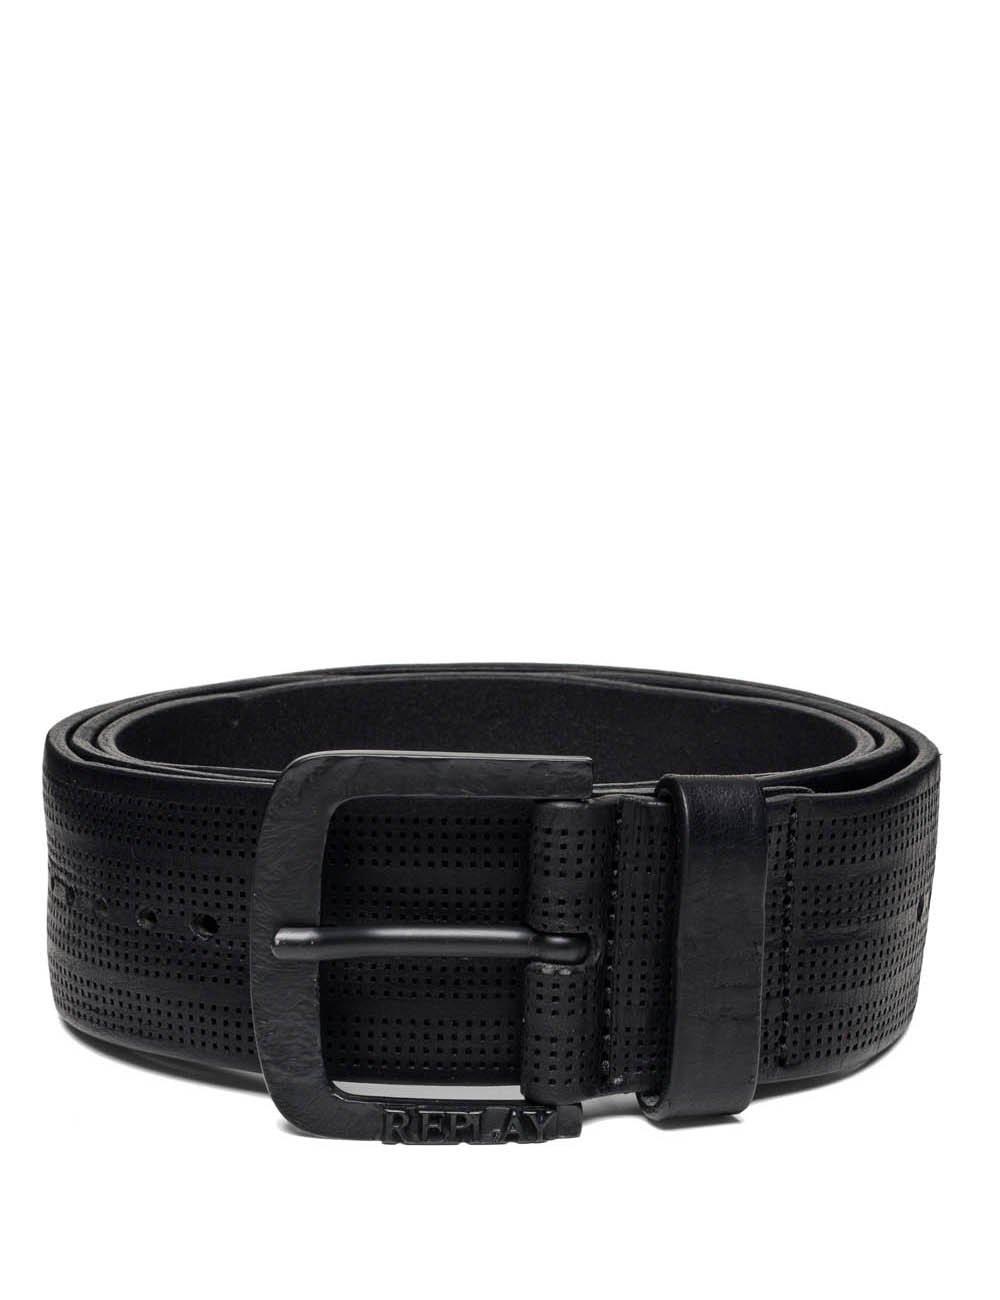 Replay Men's Men's Leather Black Belt in Size 105 Black